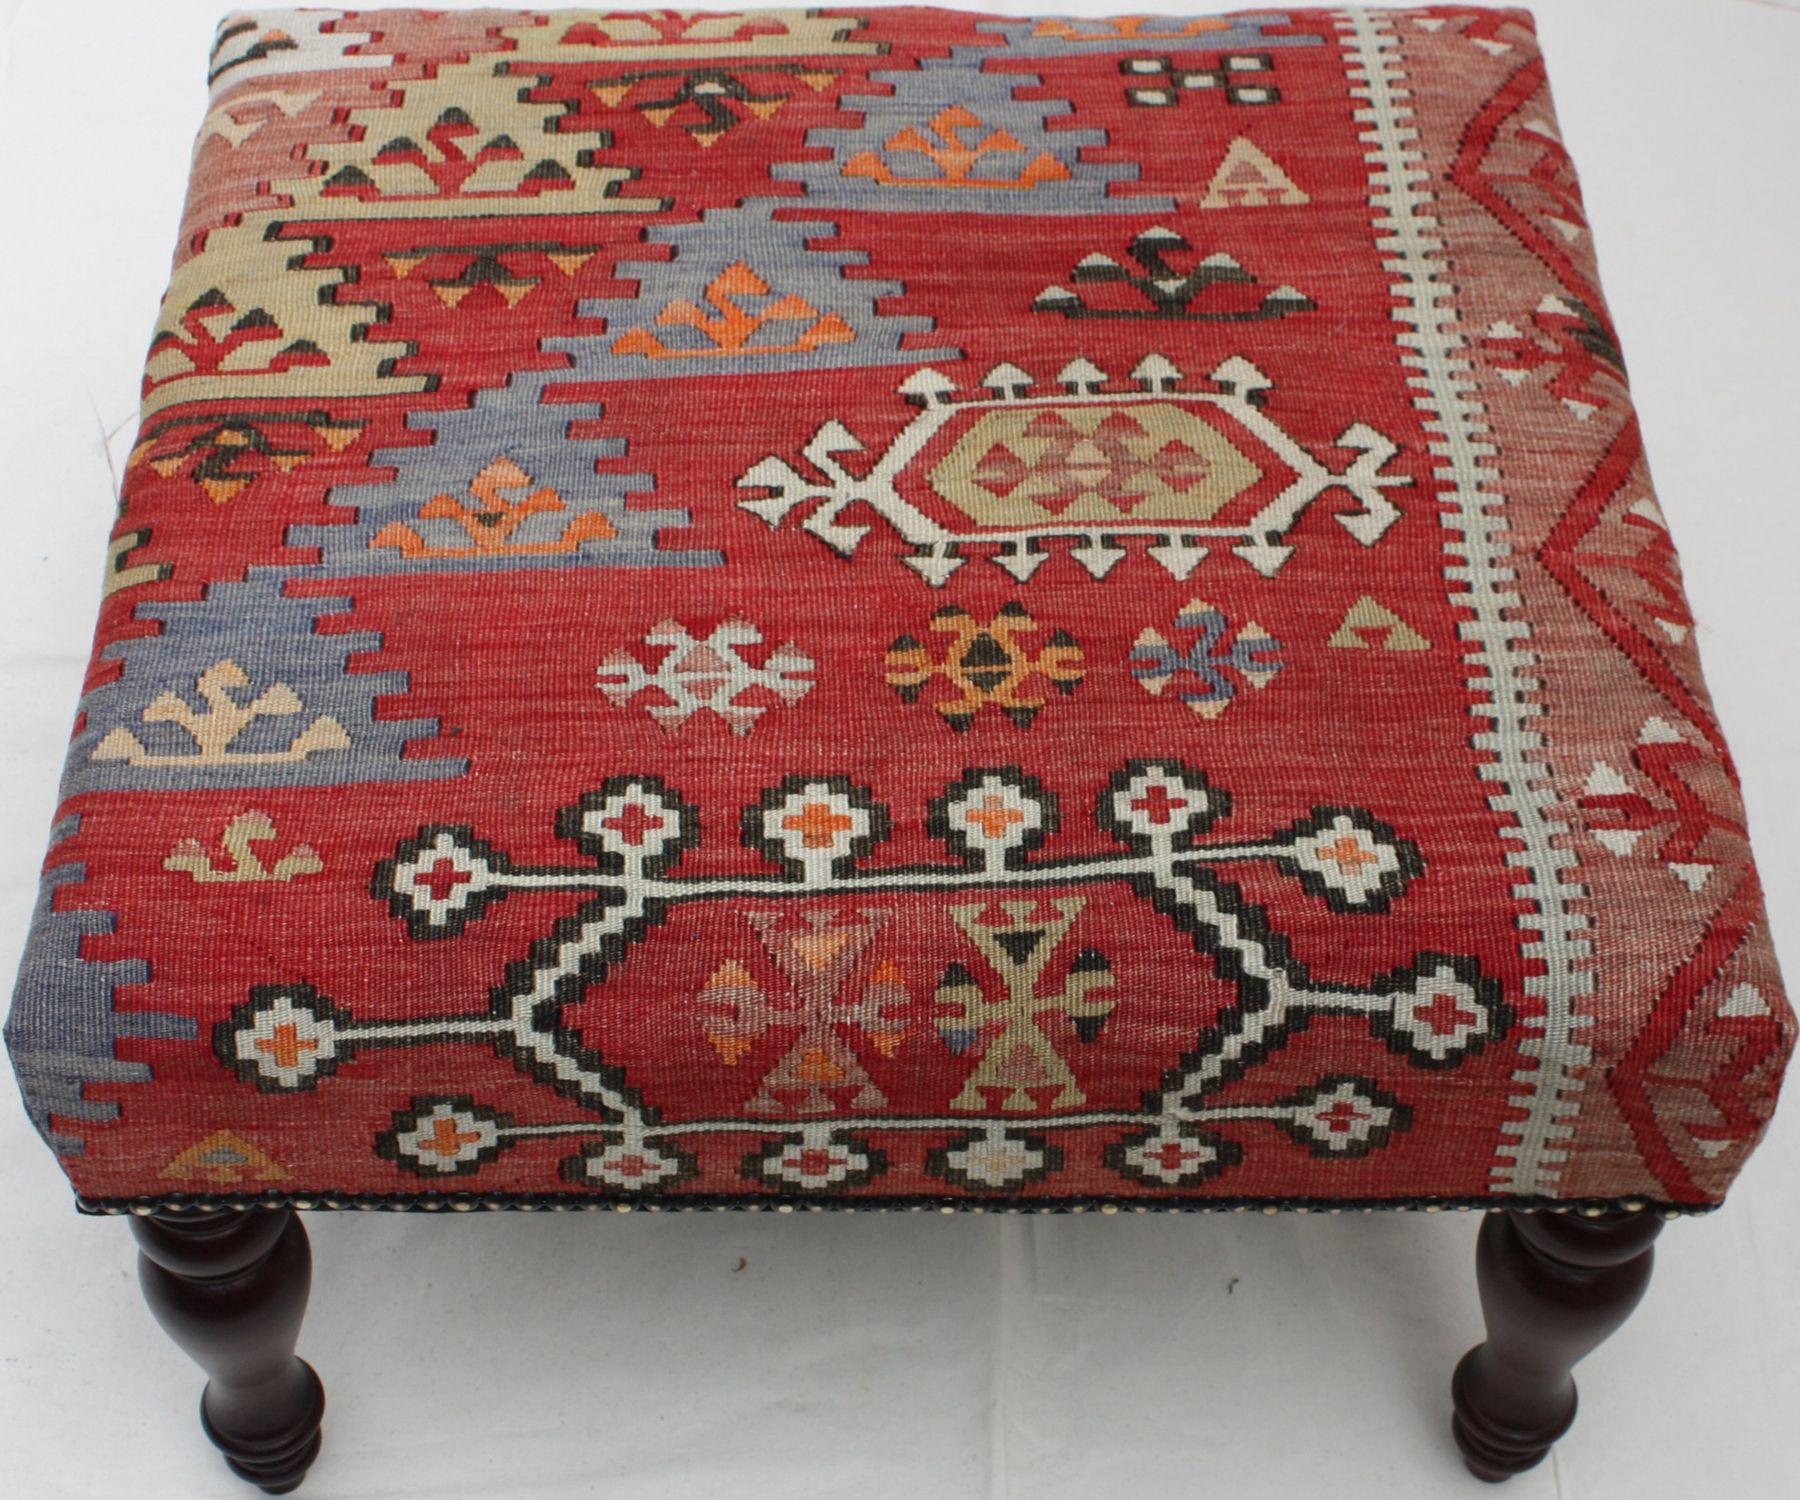 Rugs Furniture: Rugs On Carpet, Rugs